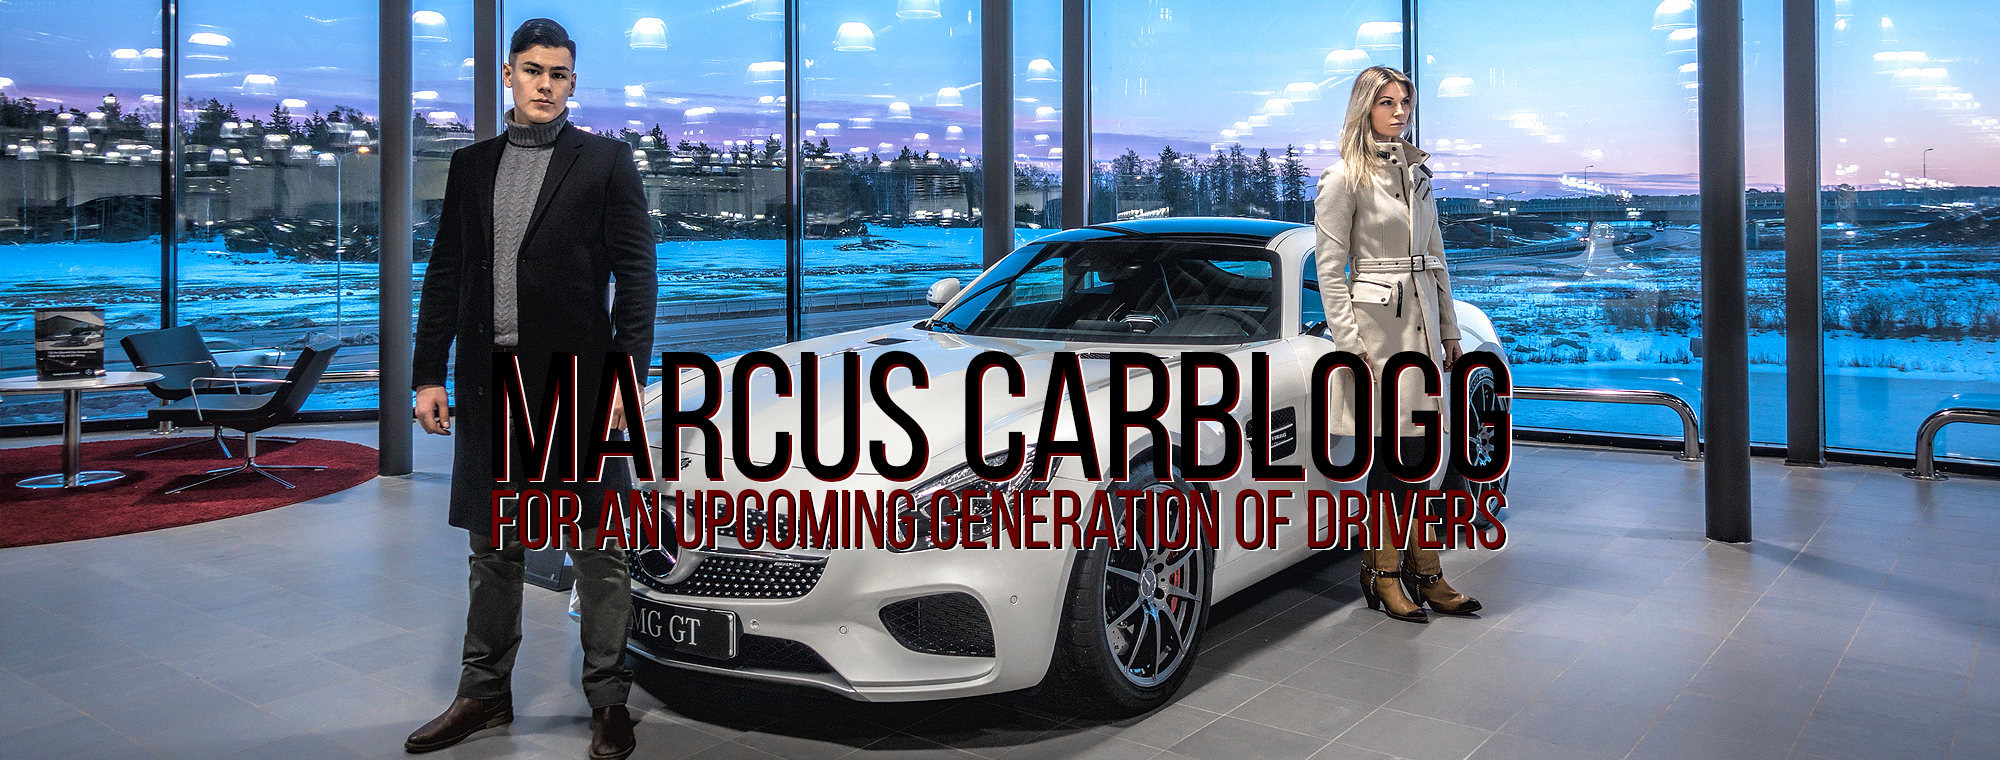 Inspiring.se_MarcusCarBlogg_Facebook_MarcusOlausson_copyright_ChrizPhotography.se_BANNER_startpage_1.jpg